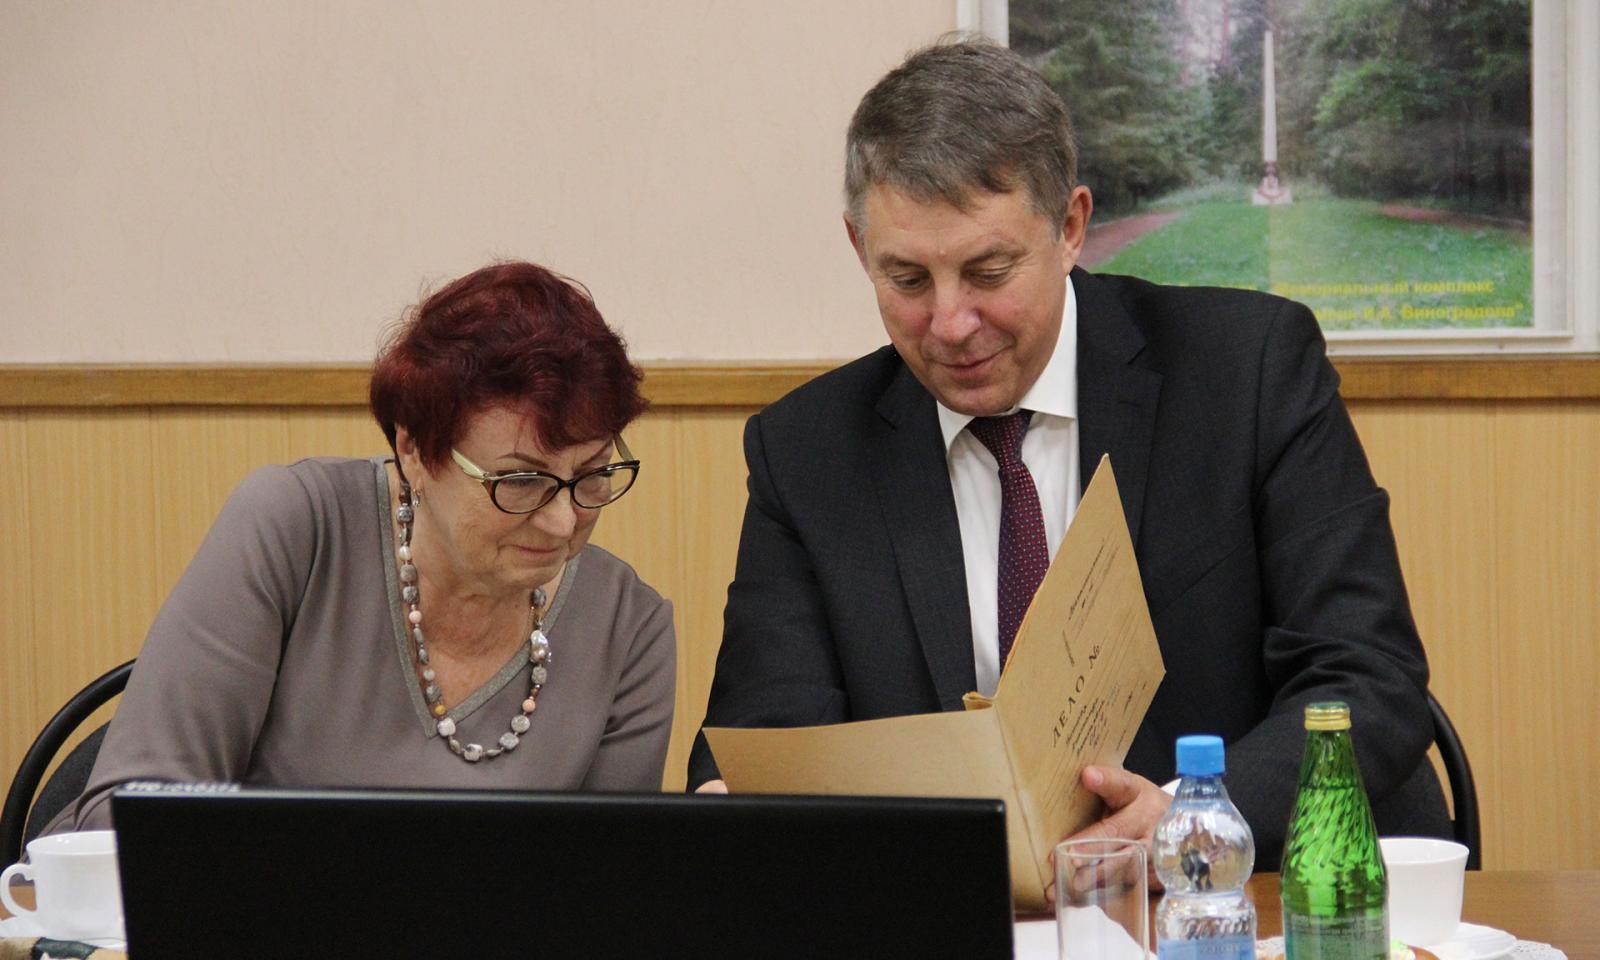 День учителя Александр Богомаз провел в БГИТУ